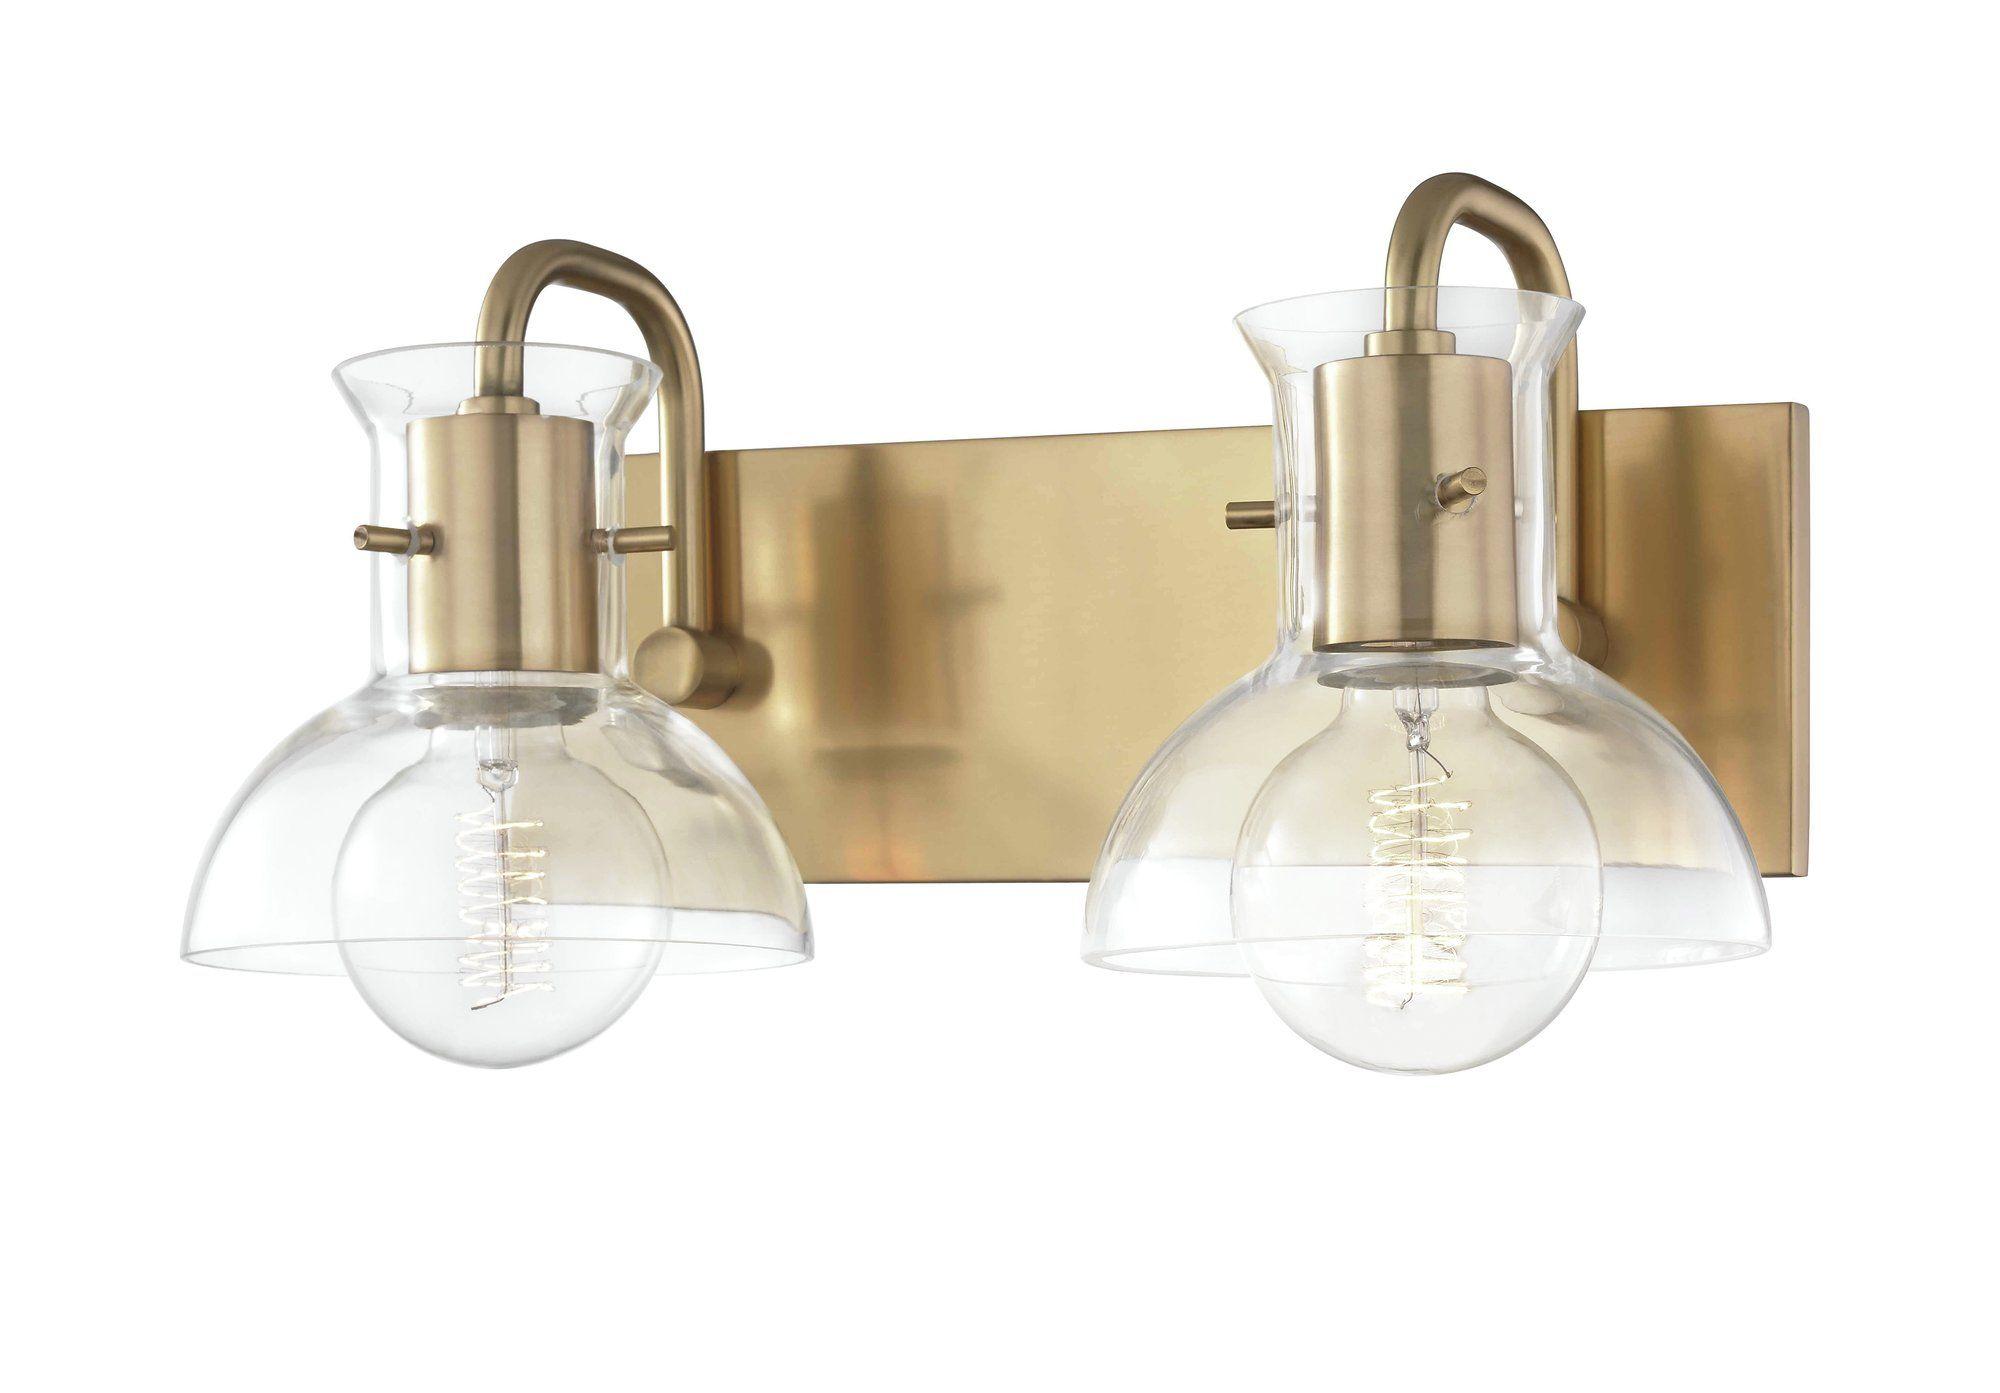 Jaxon 2 Light Vanity Light With Images Brass Bathroom Lighting